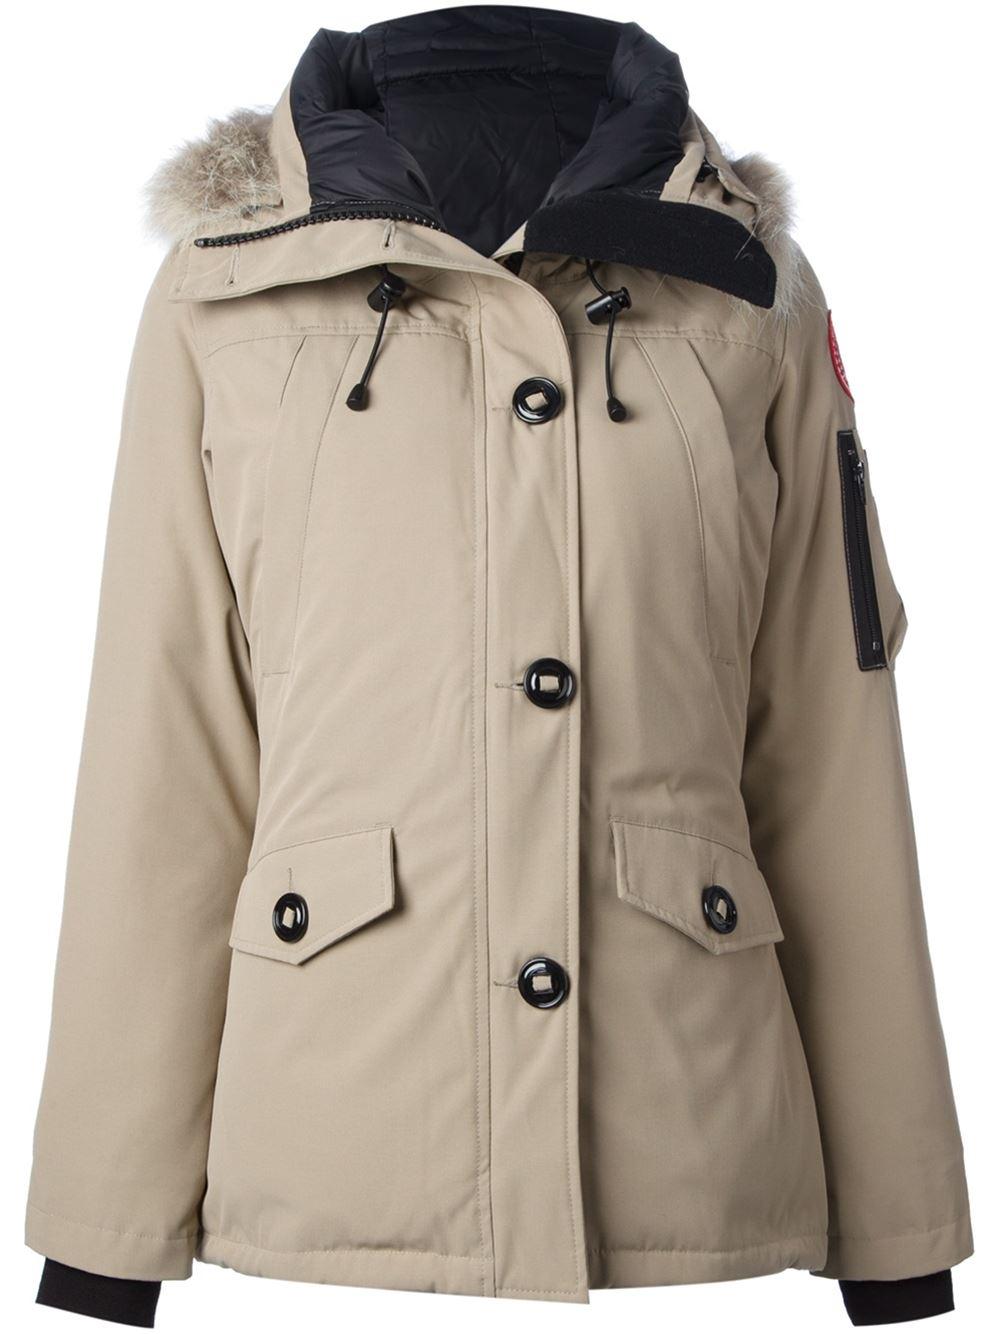 Canada Goose chateau parka online discounts - Canada goose 'montebello' Parka Jacket in Beige (nude & neutrals ...